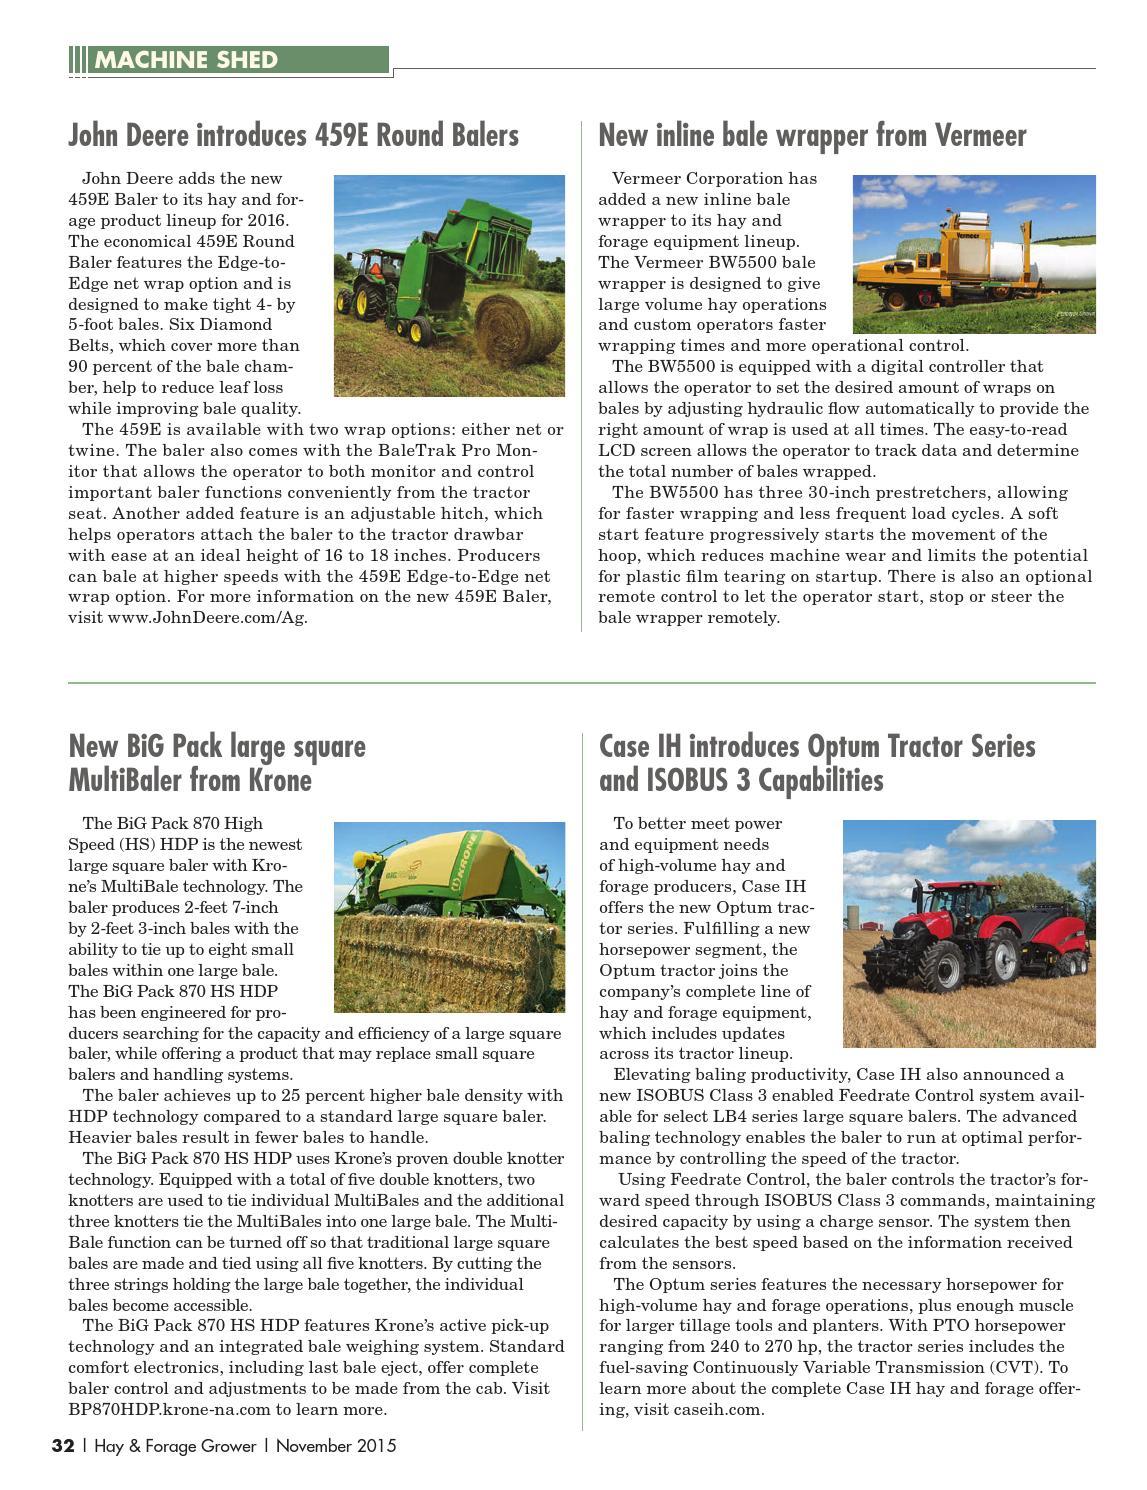 Hay & Forage Grower - November 2015